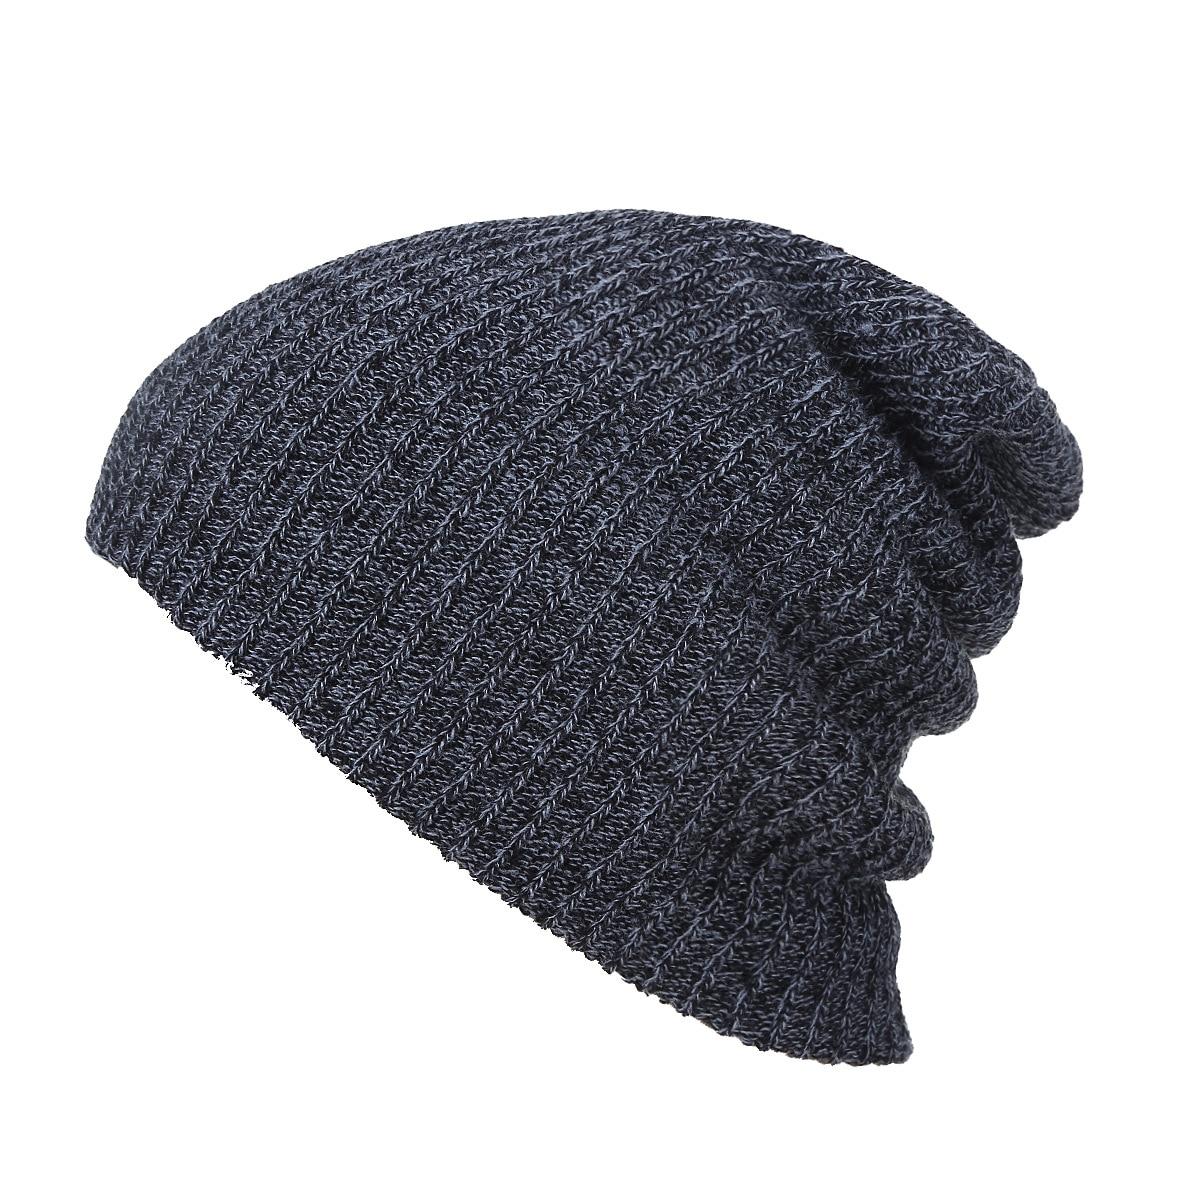 d5e842b68dcdd 2017 Nueva moda para mujer de invierno sombreros gorros Skullies unisex  caps 6 colores para hombre de sombrero de Esquí snowboard skateboard Envío  Gratis en ...